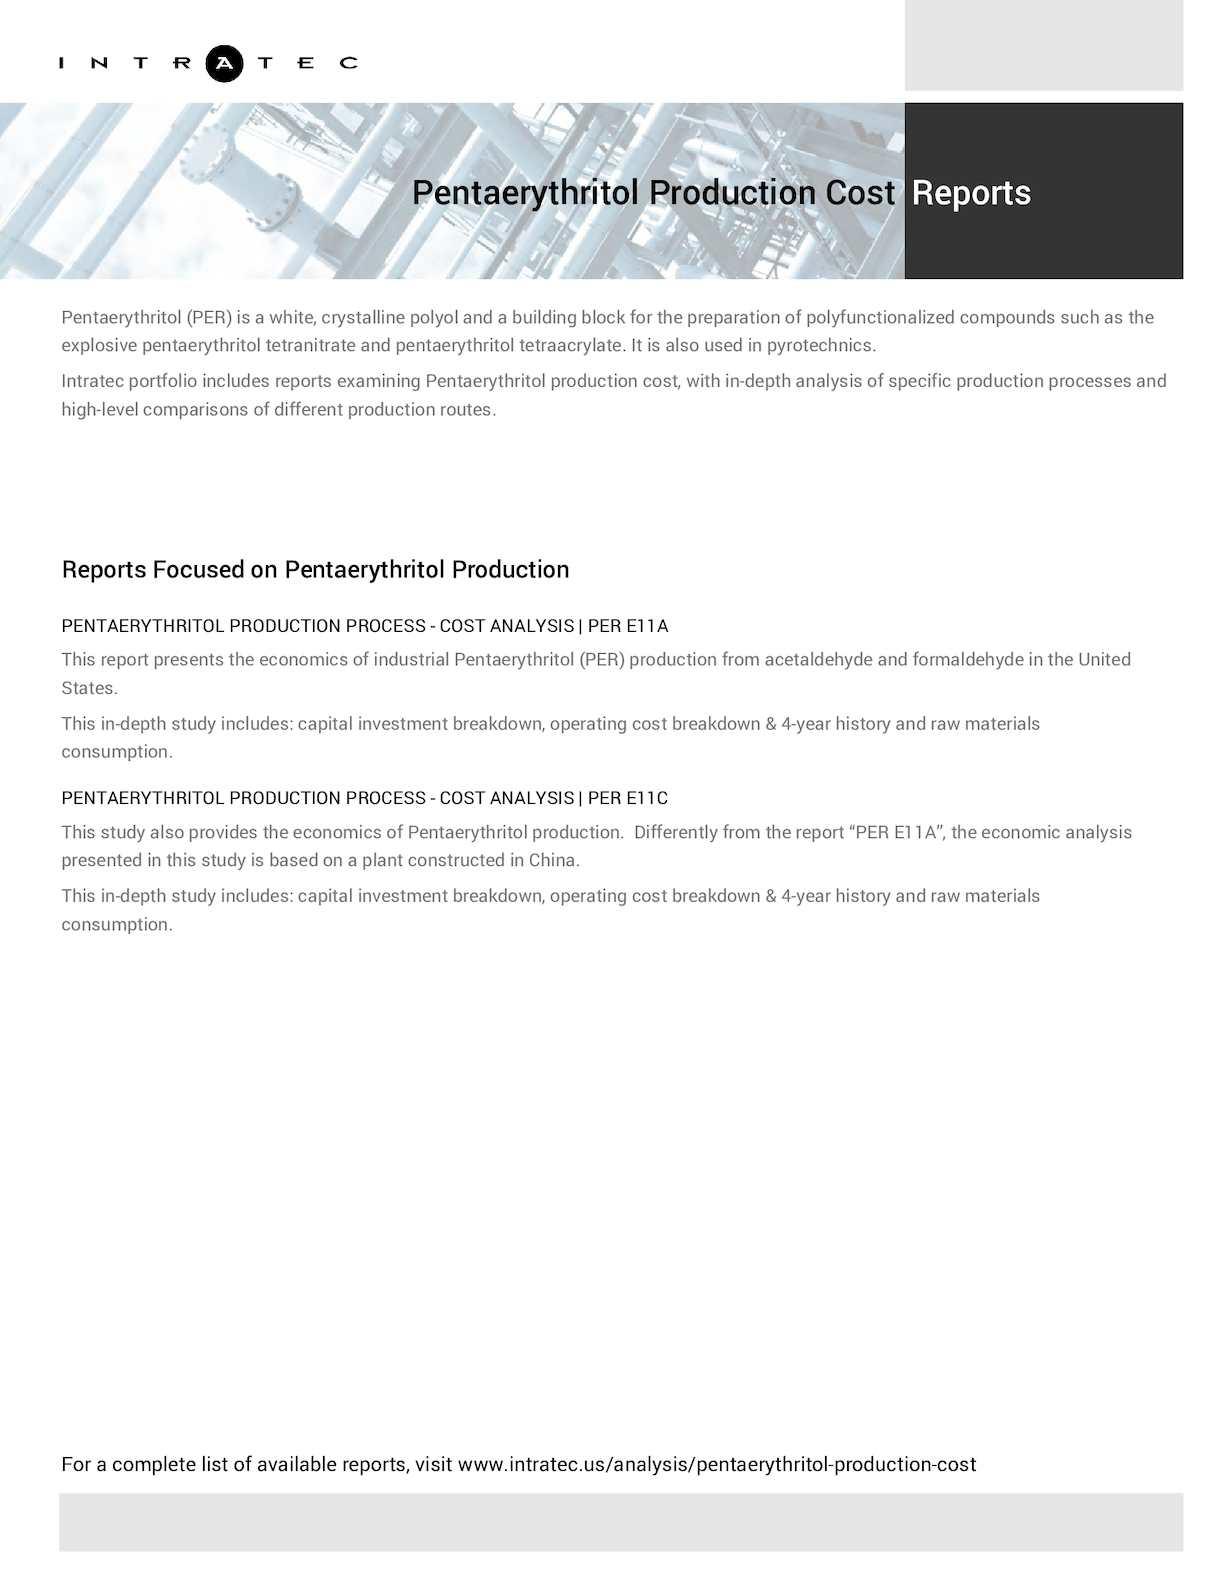 Calaméo - Techno-Economic Assessment about Pentaerythritol